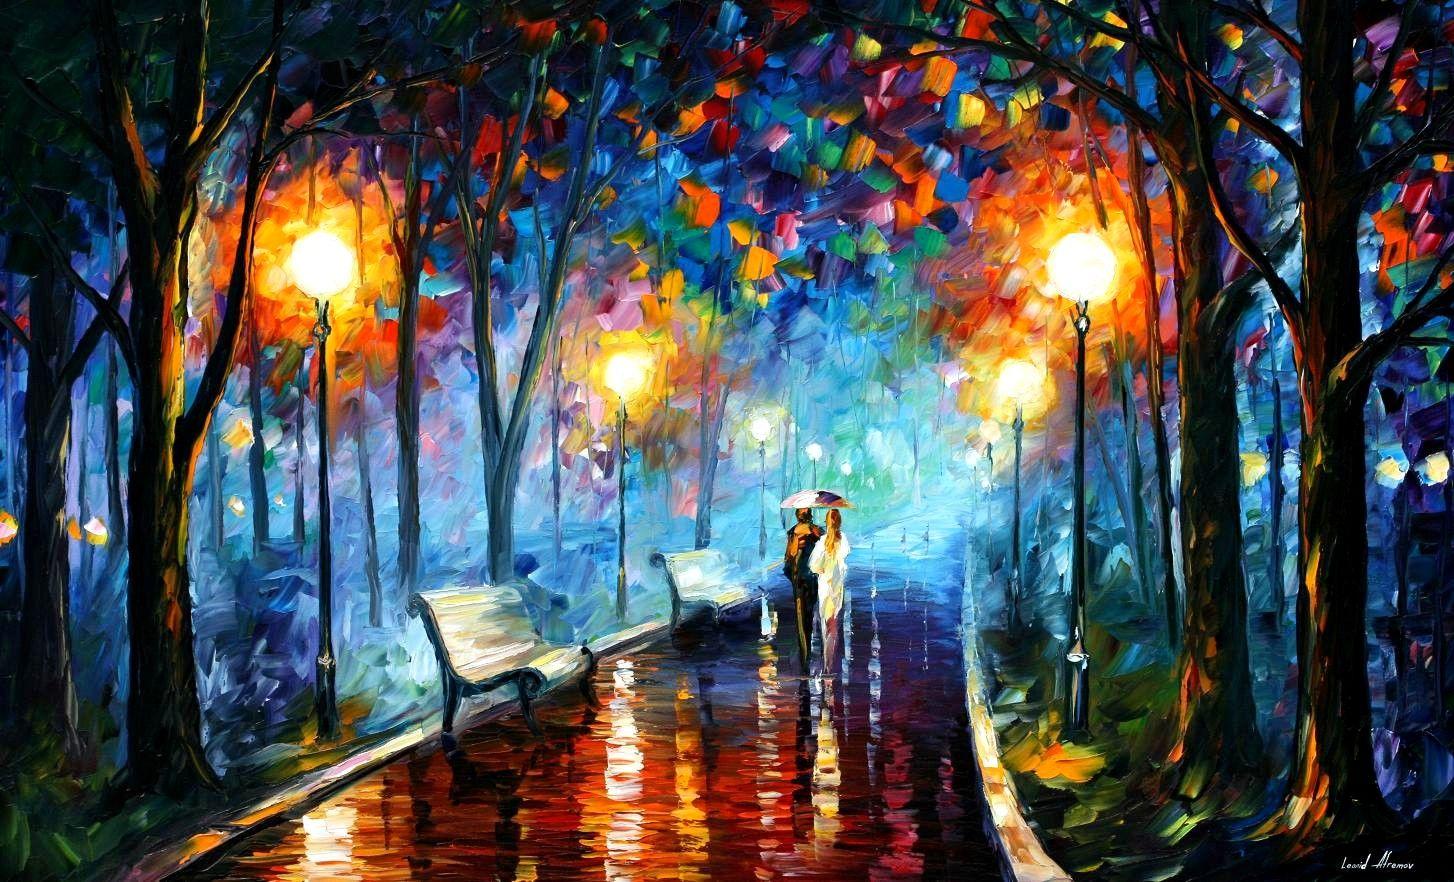 A beautiful stroll that I'd like to take.